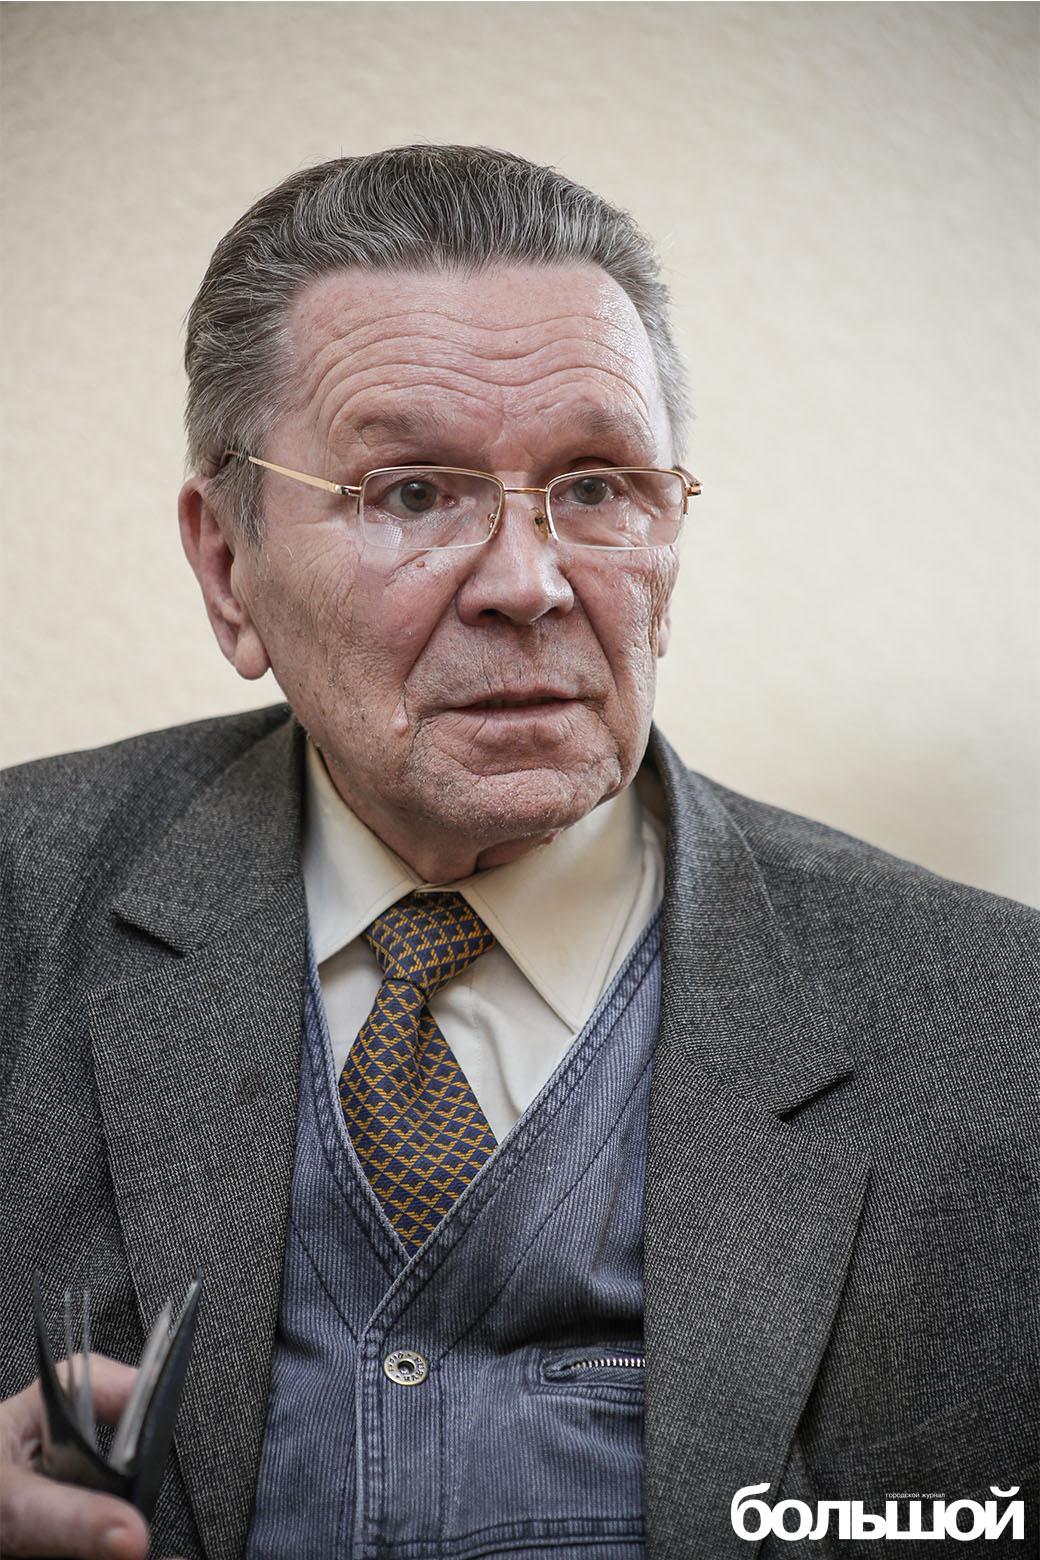 Владислав Петрович Миронов